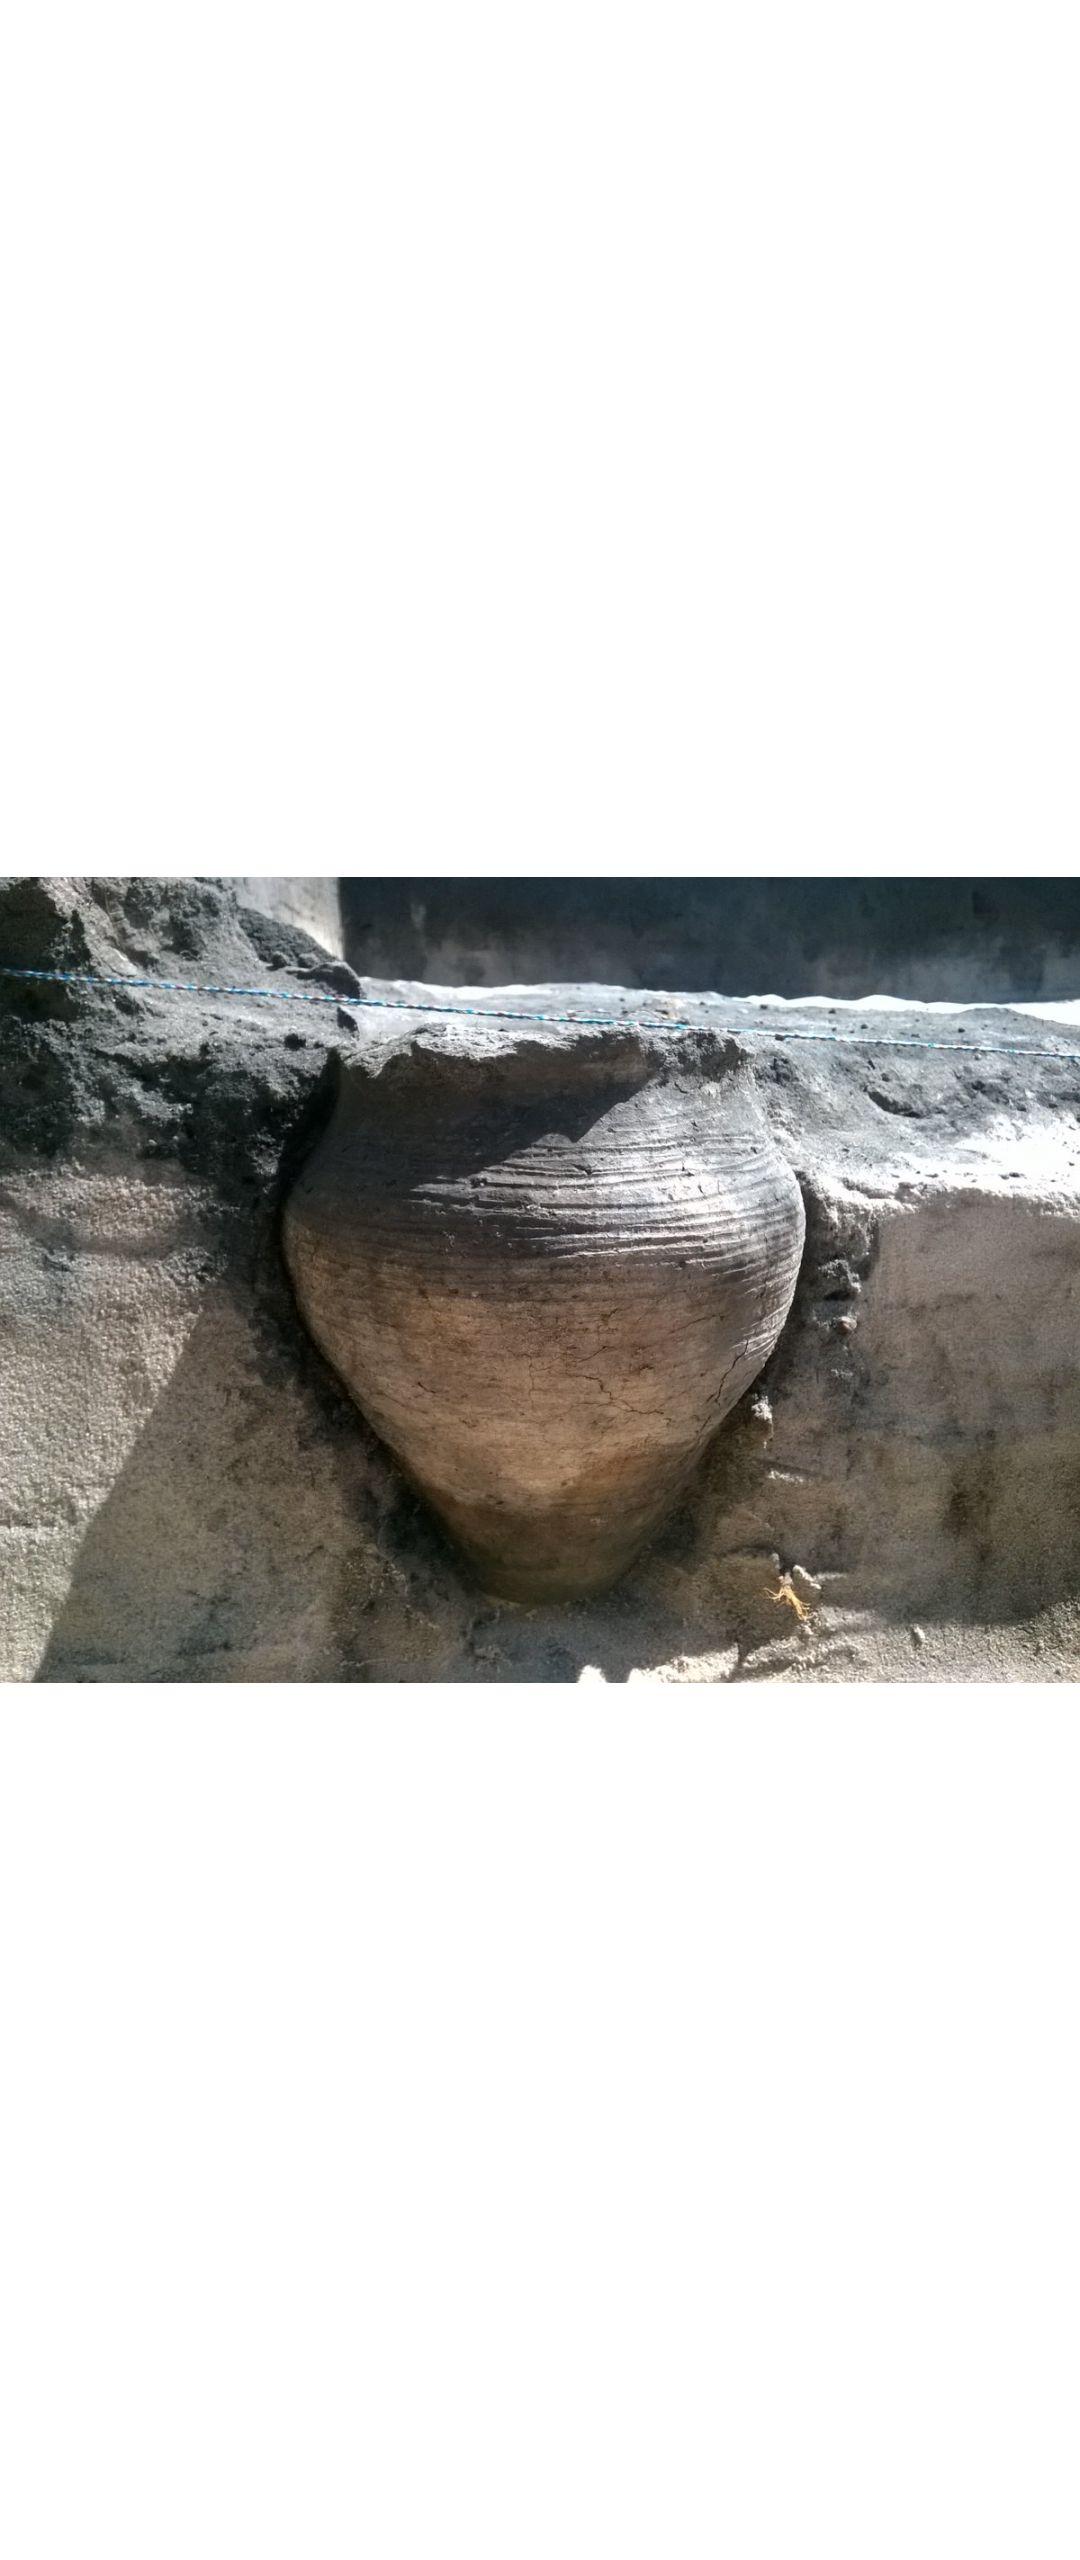 Vasija de arcilla